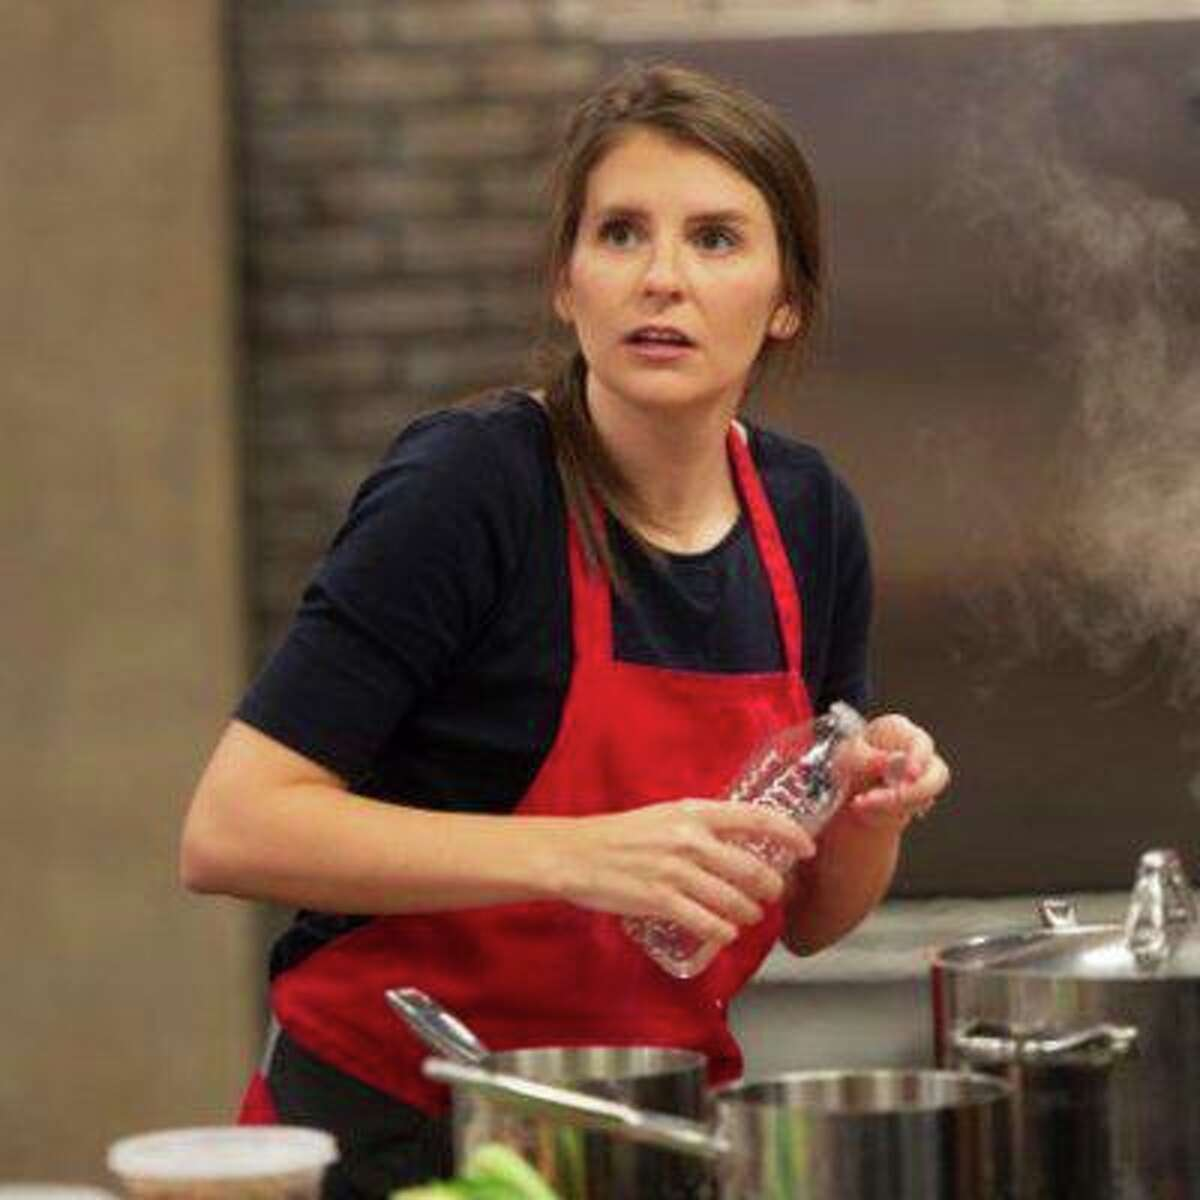 Allison Wolfe of Richmond won season 15 of the Food Network's